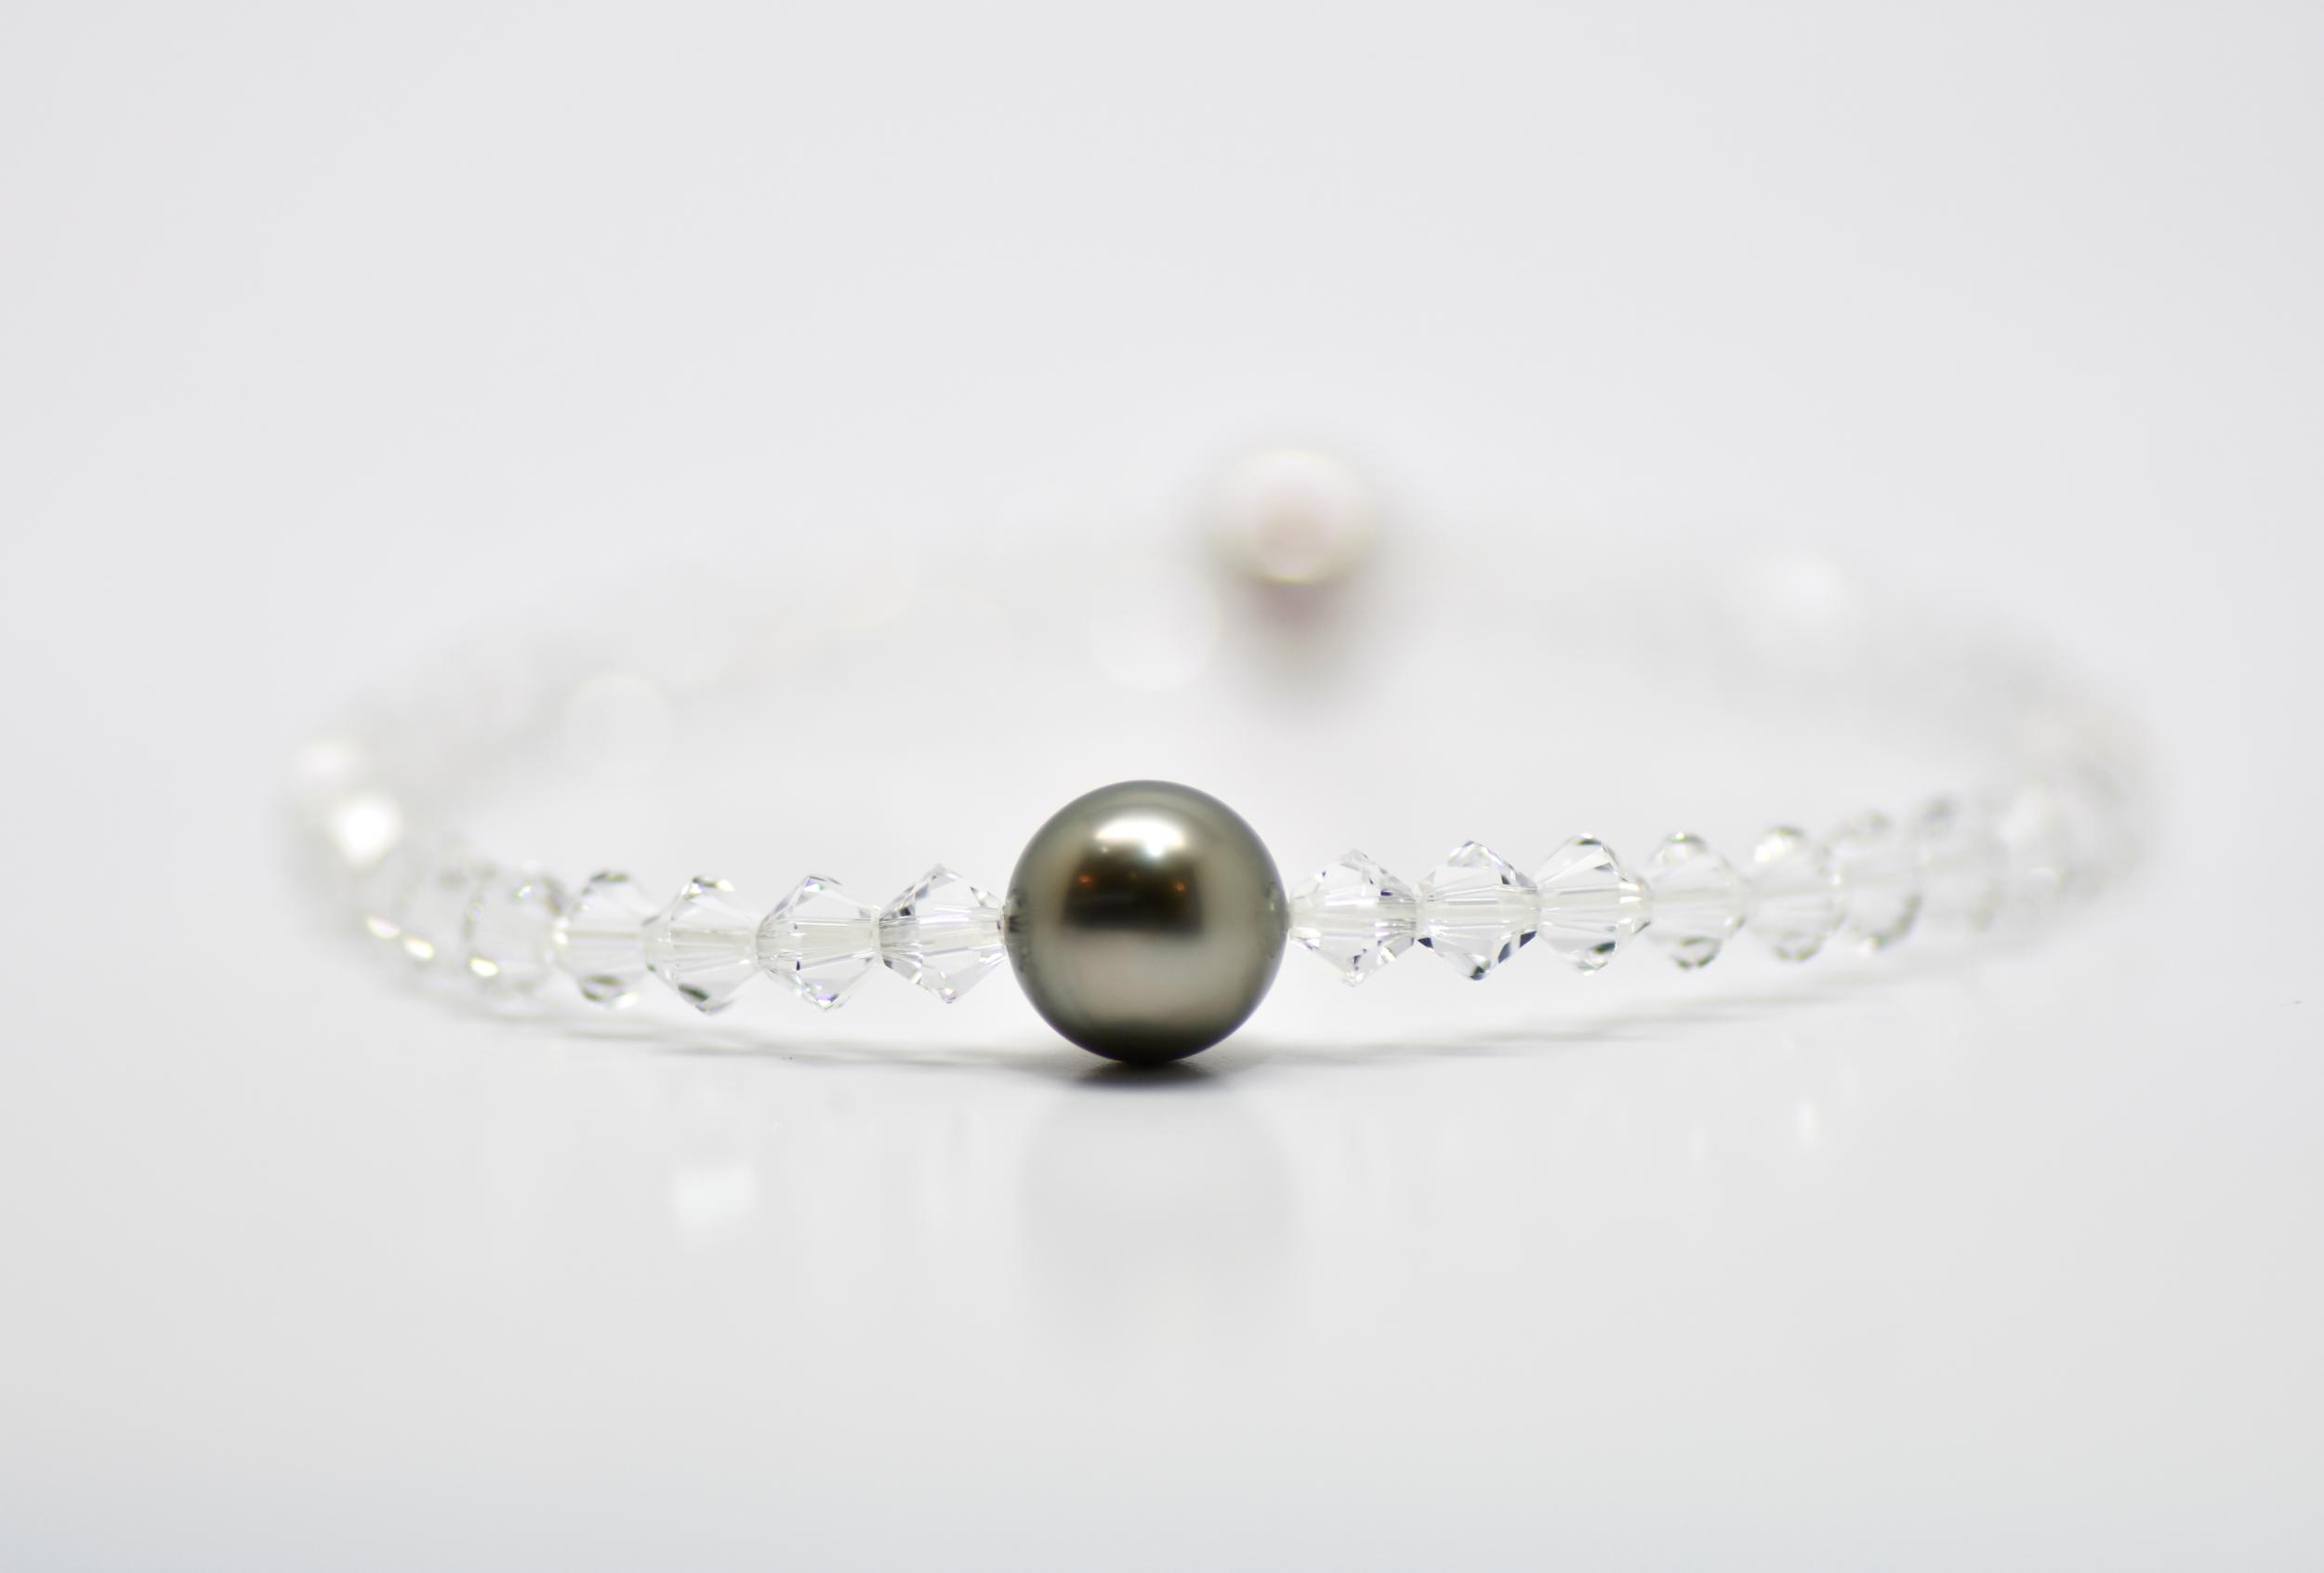 Manhattan white 4 mm swarovski beads and 1 Tahiti pearl bracelet